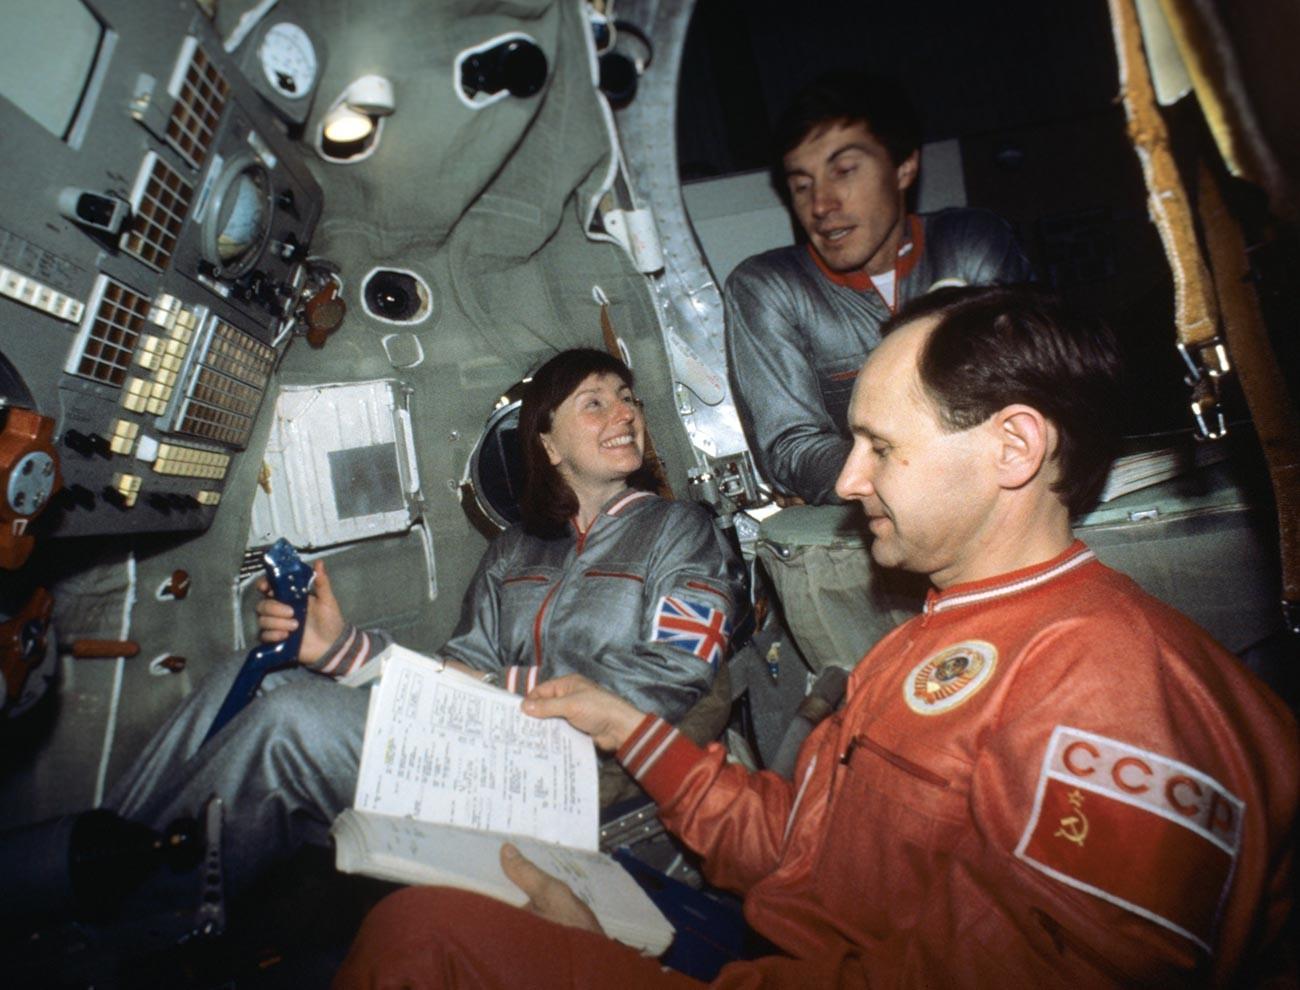 Équipage soviéto-britannique à bord de la station: Helen Sharman, Sergueï Krikaliov et Anatoli Artsebarski